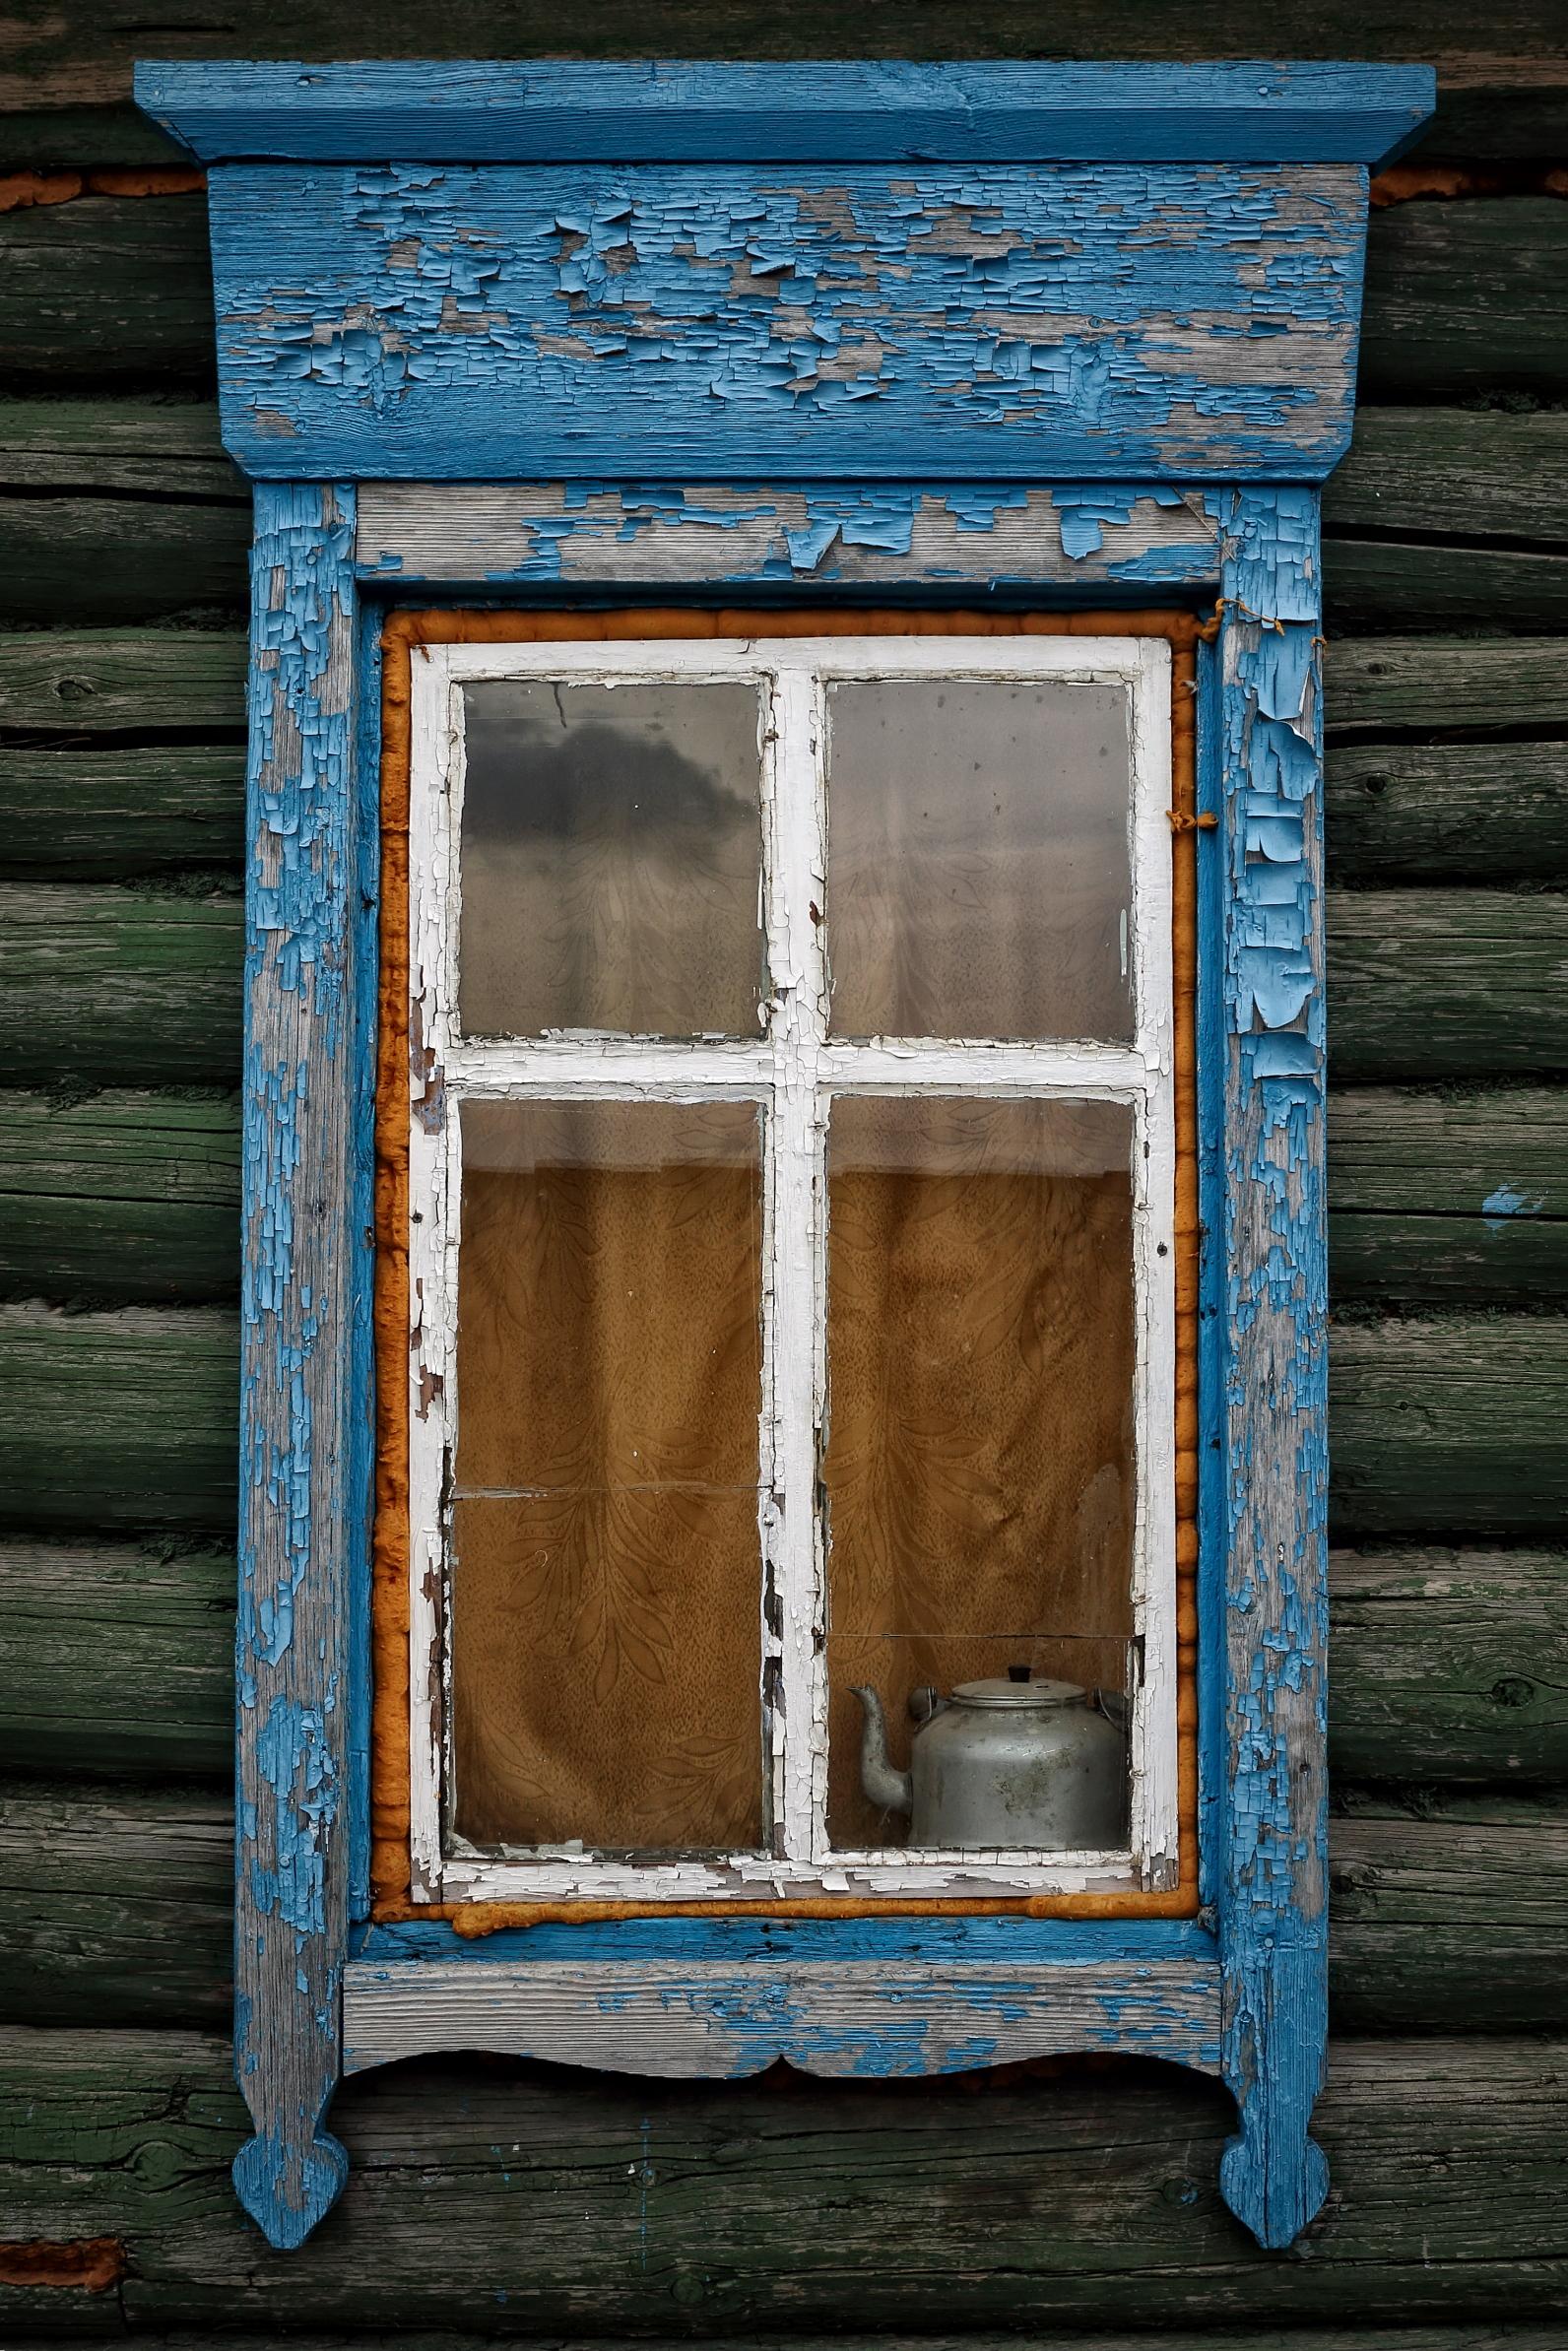 bajkal_137